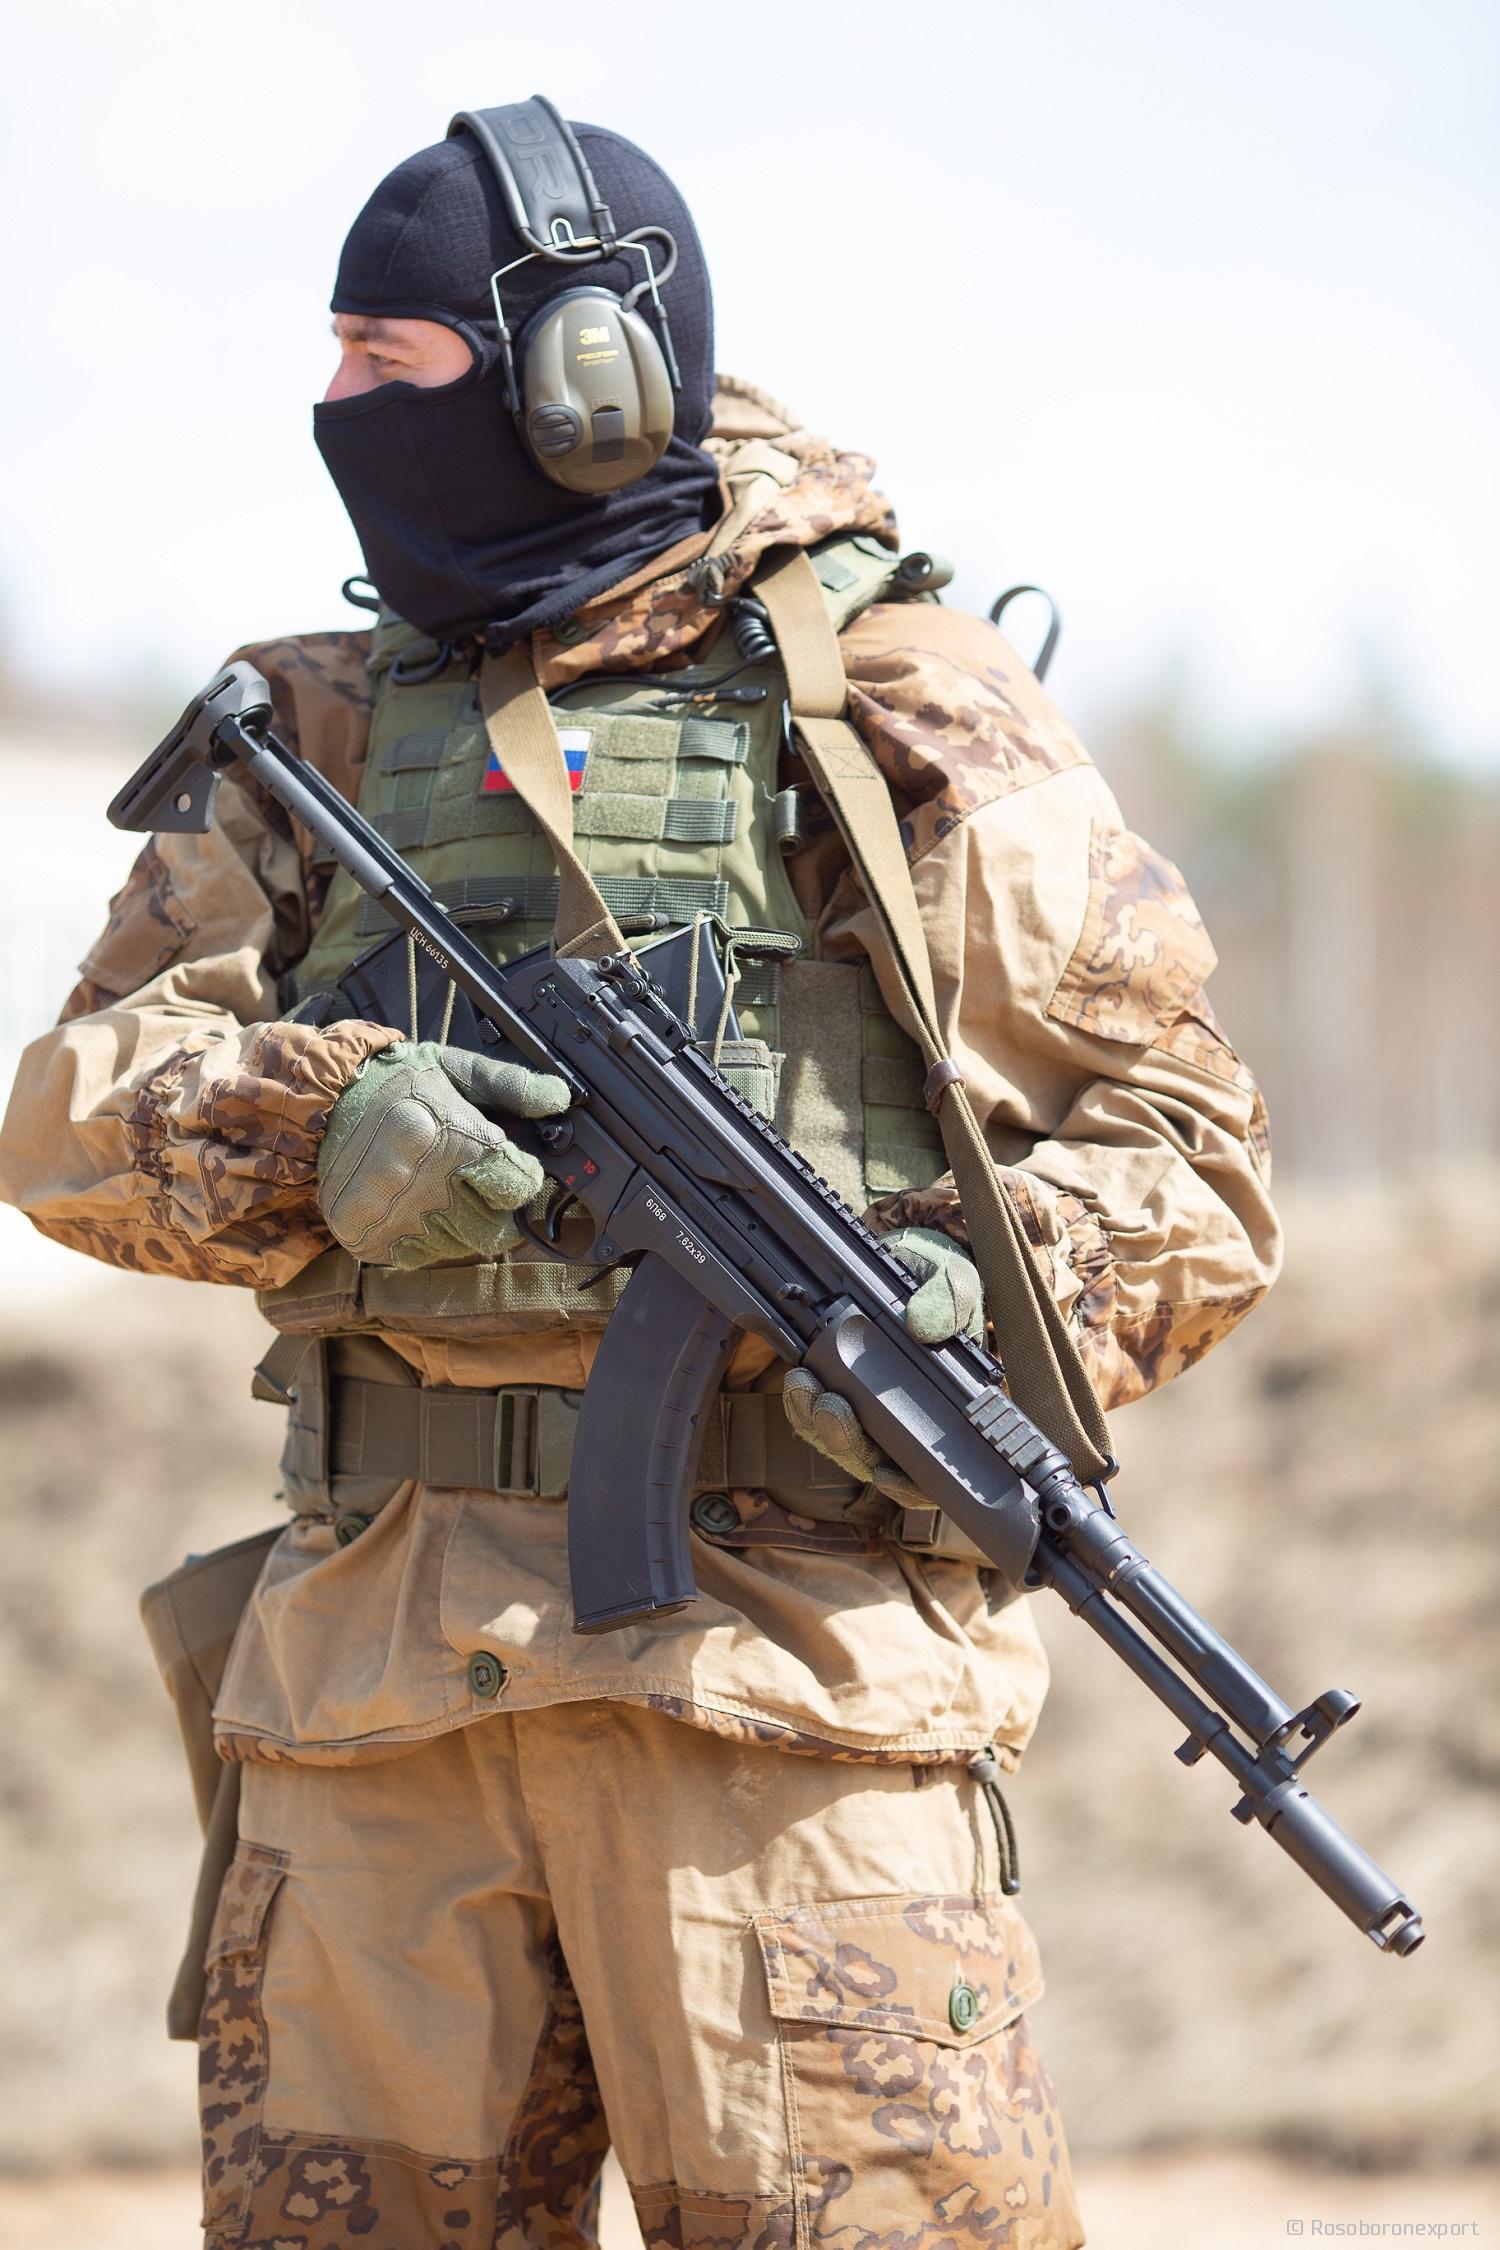 Russian Assault Rifles/Carbines/Machine Guns Thread: #2 - Page 10 Ea370c74989afa6571d0821c1b66aff5